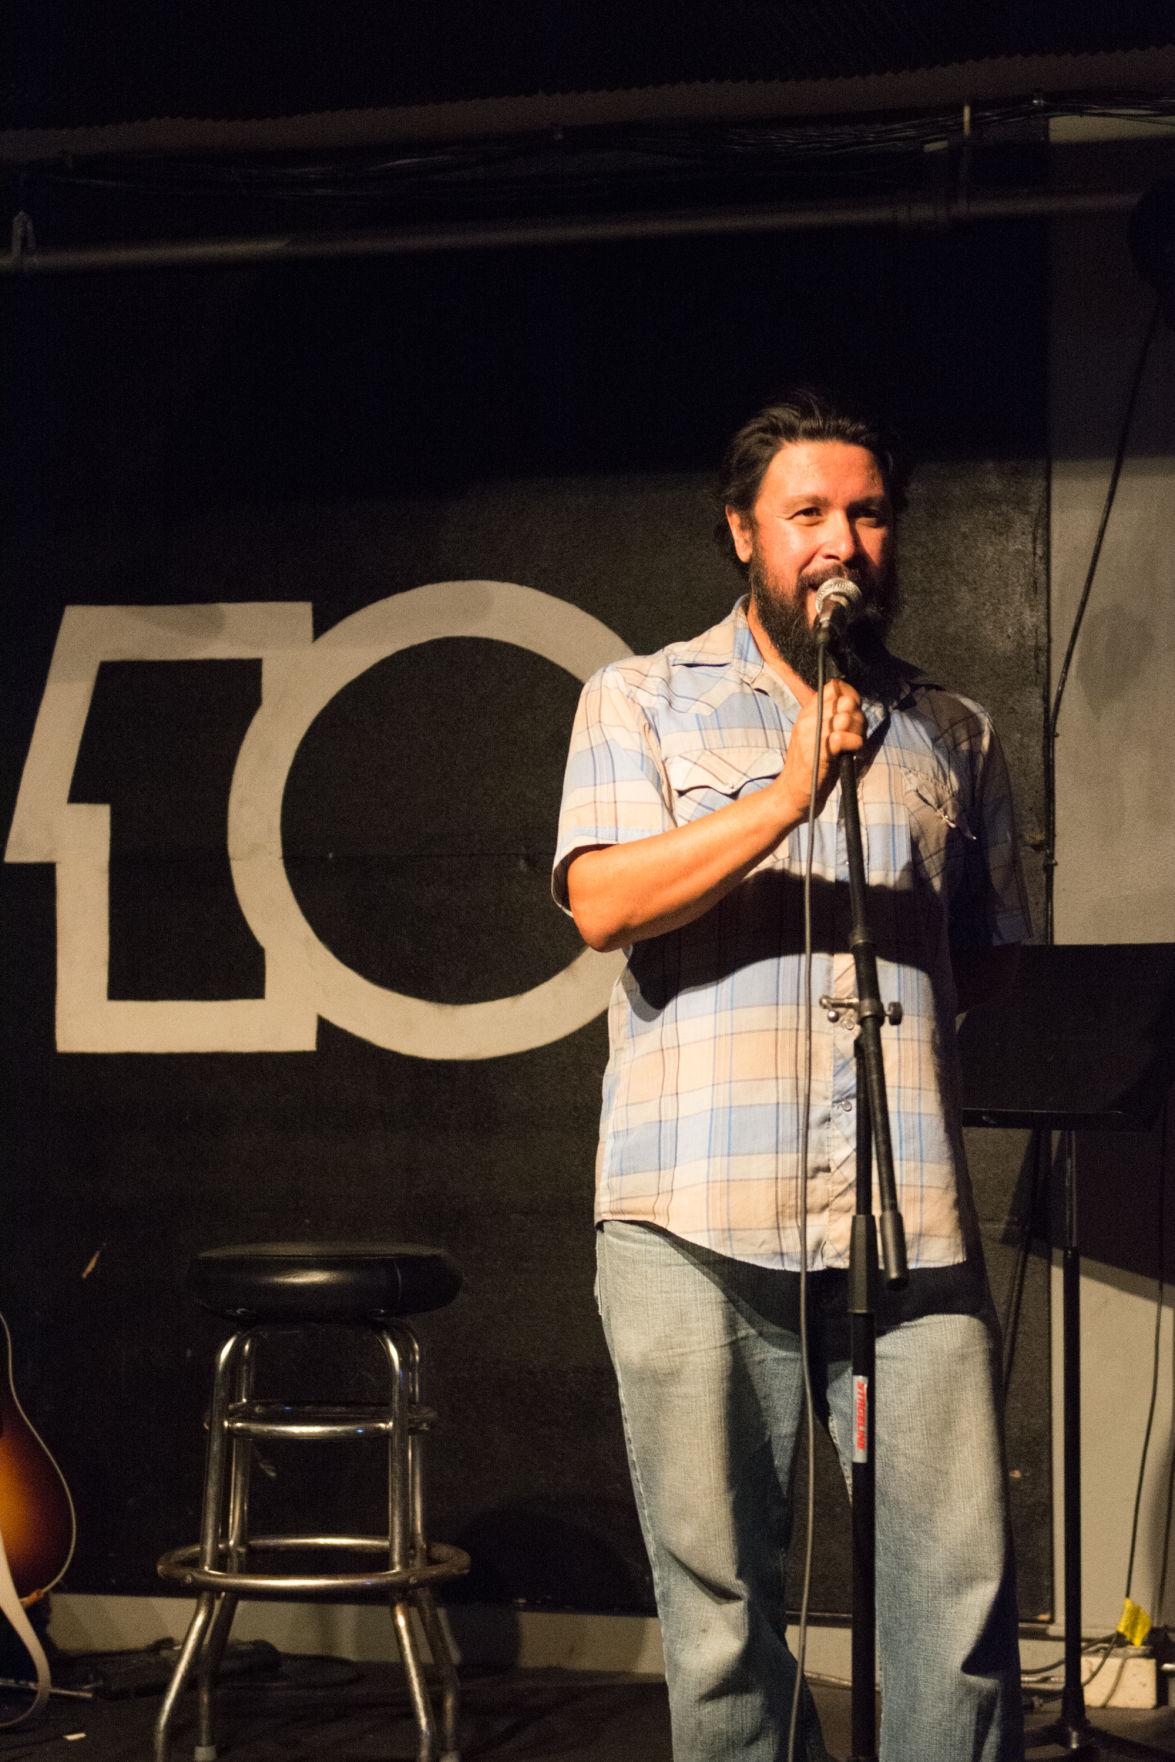 Lot 10 Open Mic's host Leon Arguello